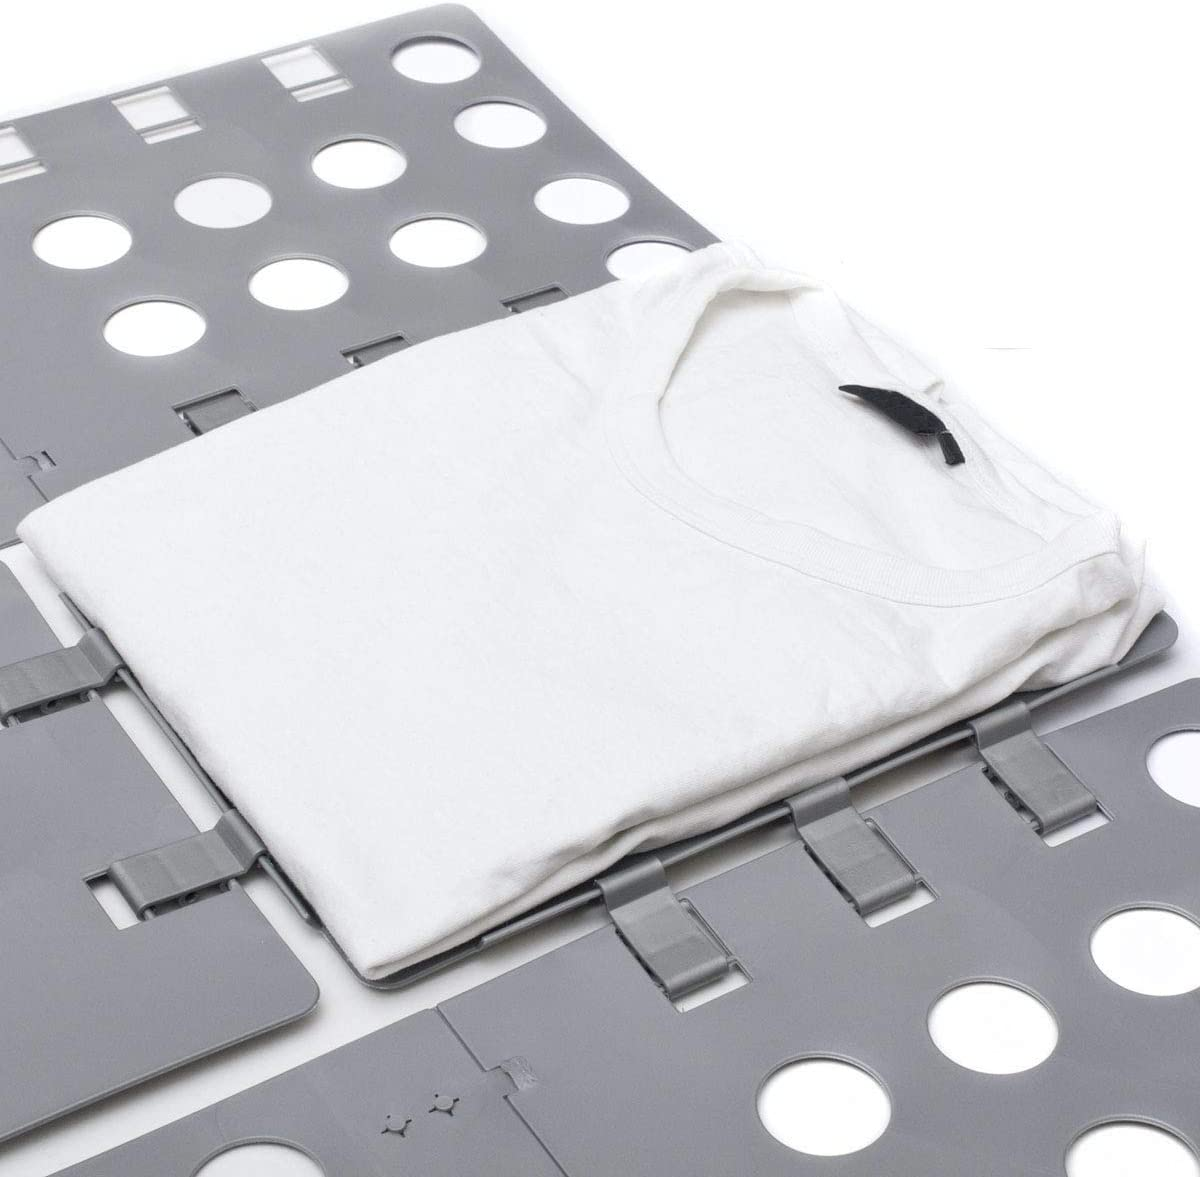 Carpeta de lavandería profesional Carpeta plegable de 3ra generación Carpeta de camisa Ayuda plegable de tabla plegable